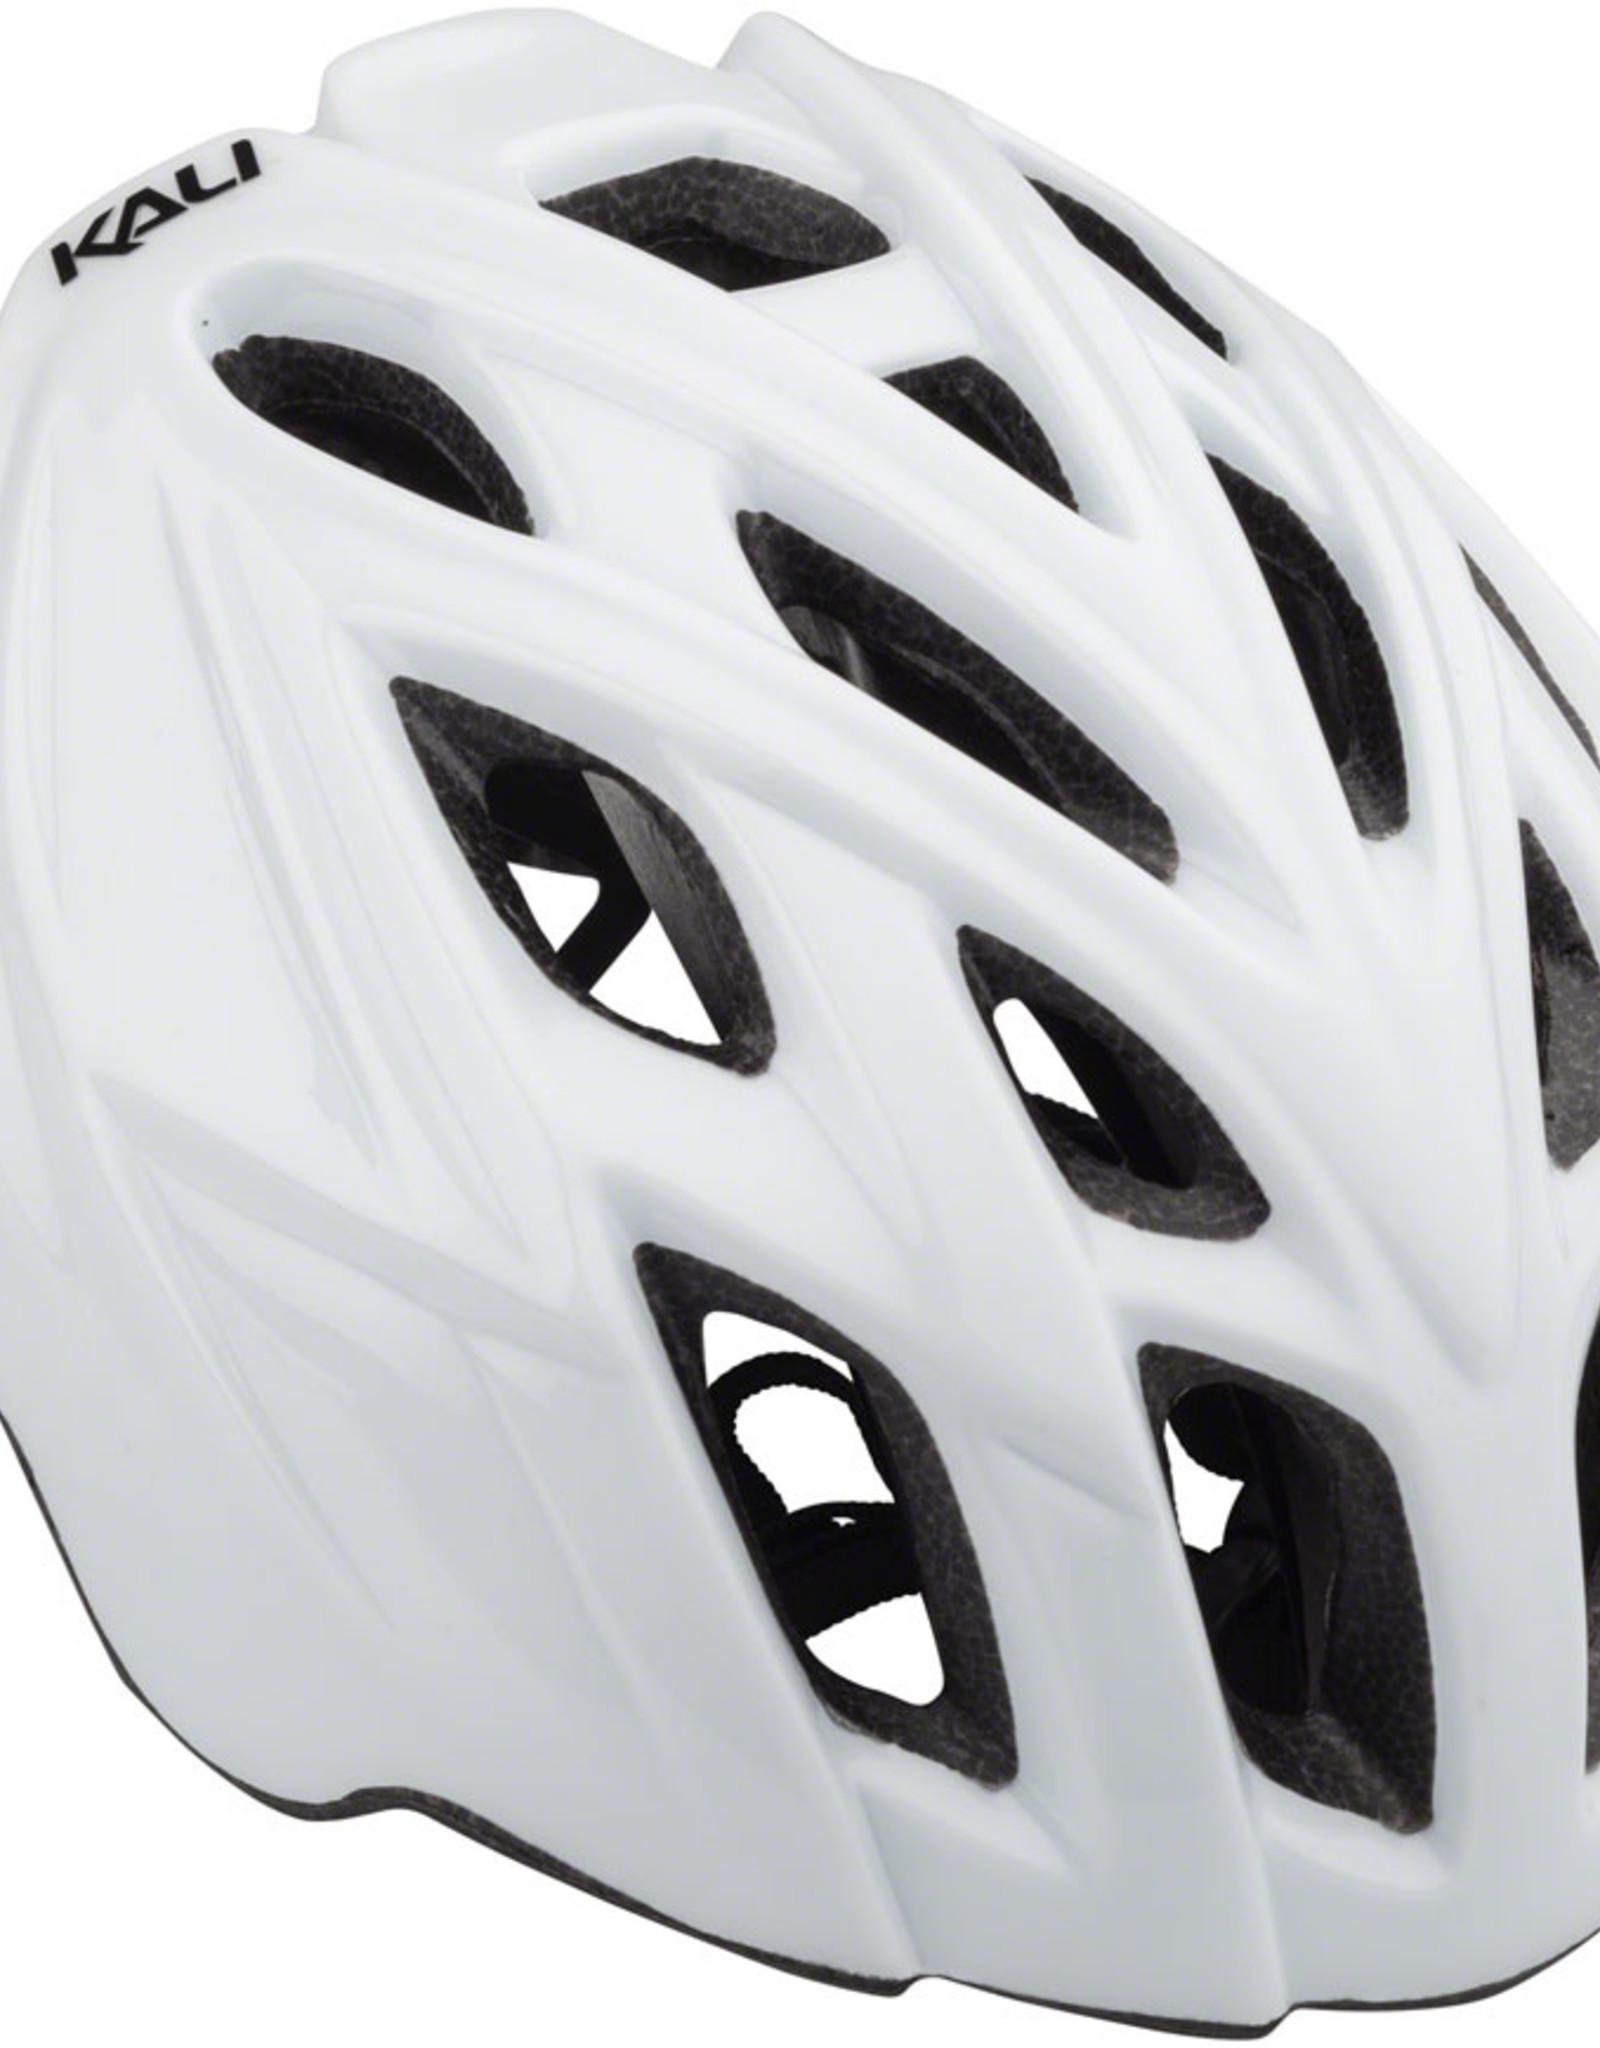 Kali Protectives Kali Protectives Chakra Mono Helmet - Solid Gloss White, Small/Medium